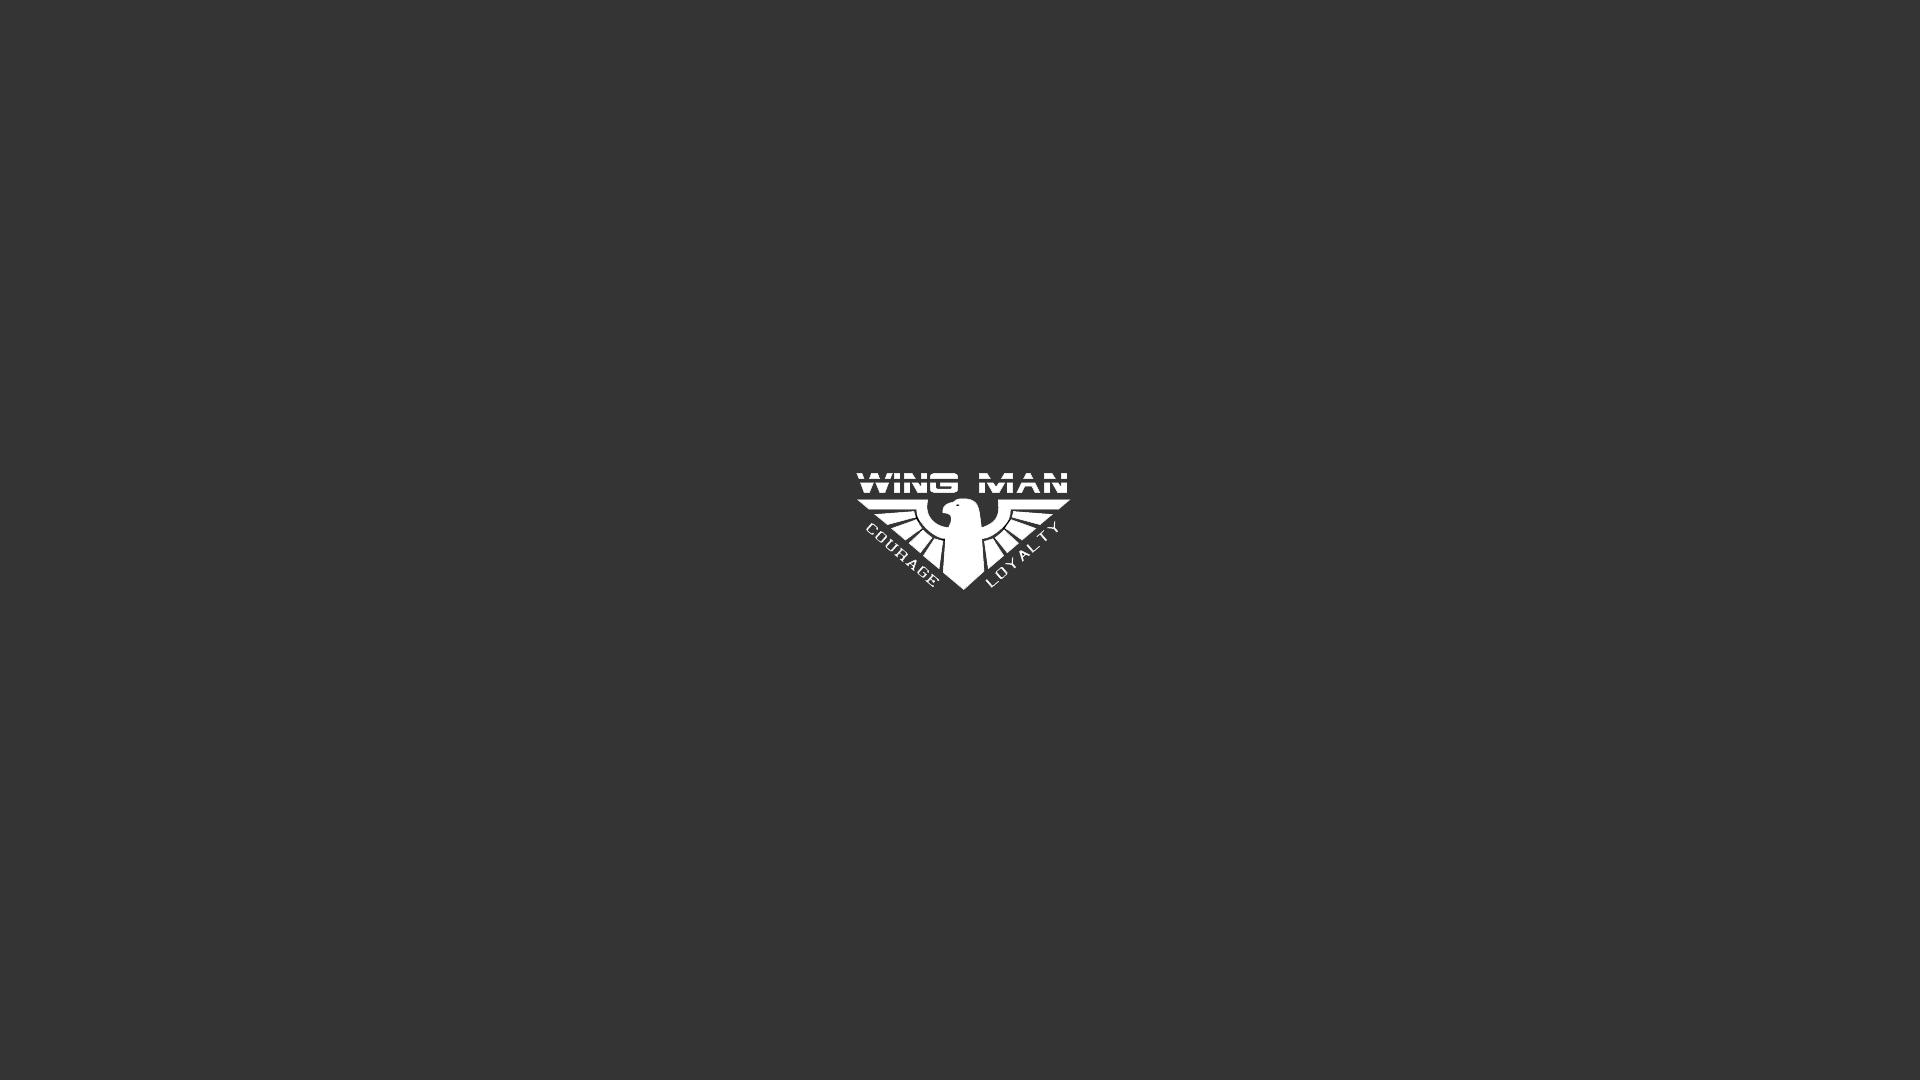 wingman hd wallpaper | background image | 1920x1080 | id:445568